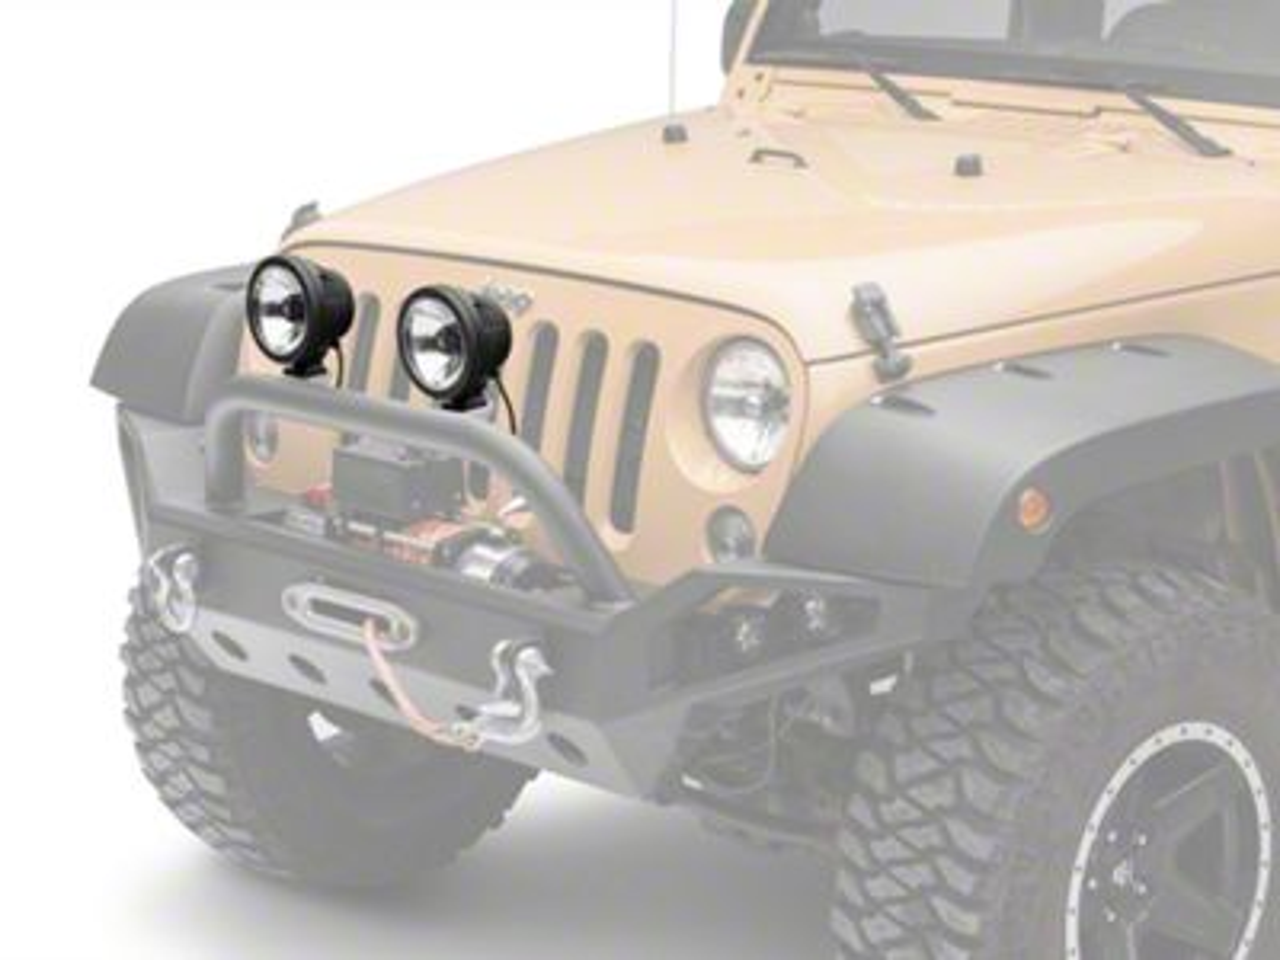 KC HiLiTES 6 in. Gravity Pro-Sport LED Light - Driving Beam